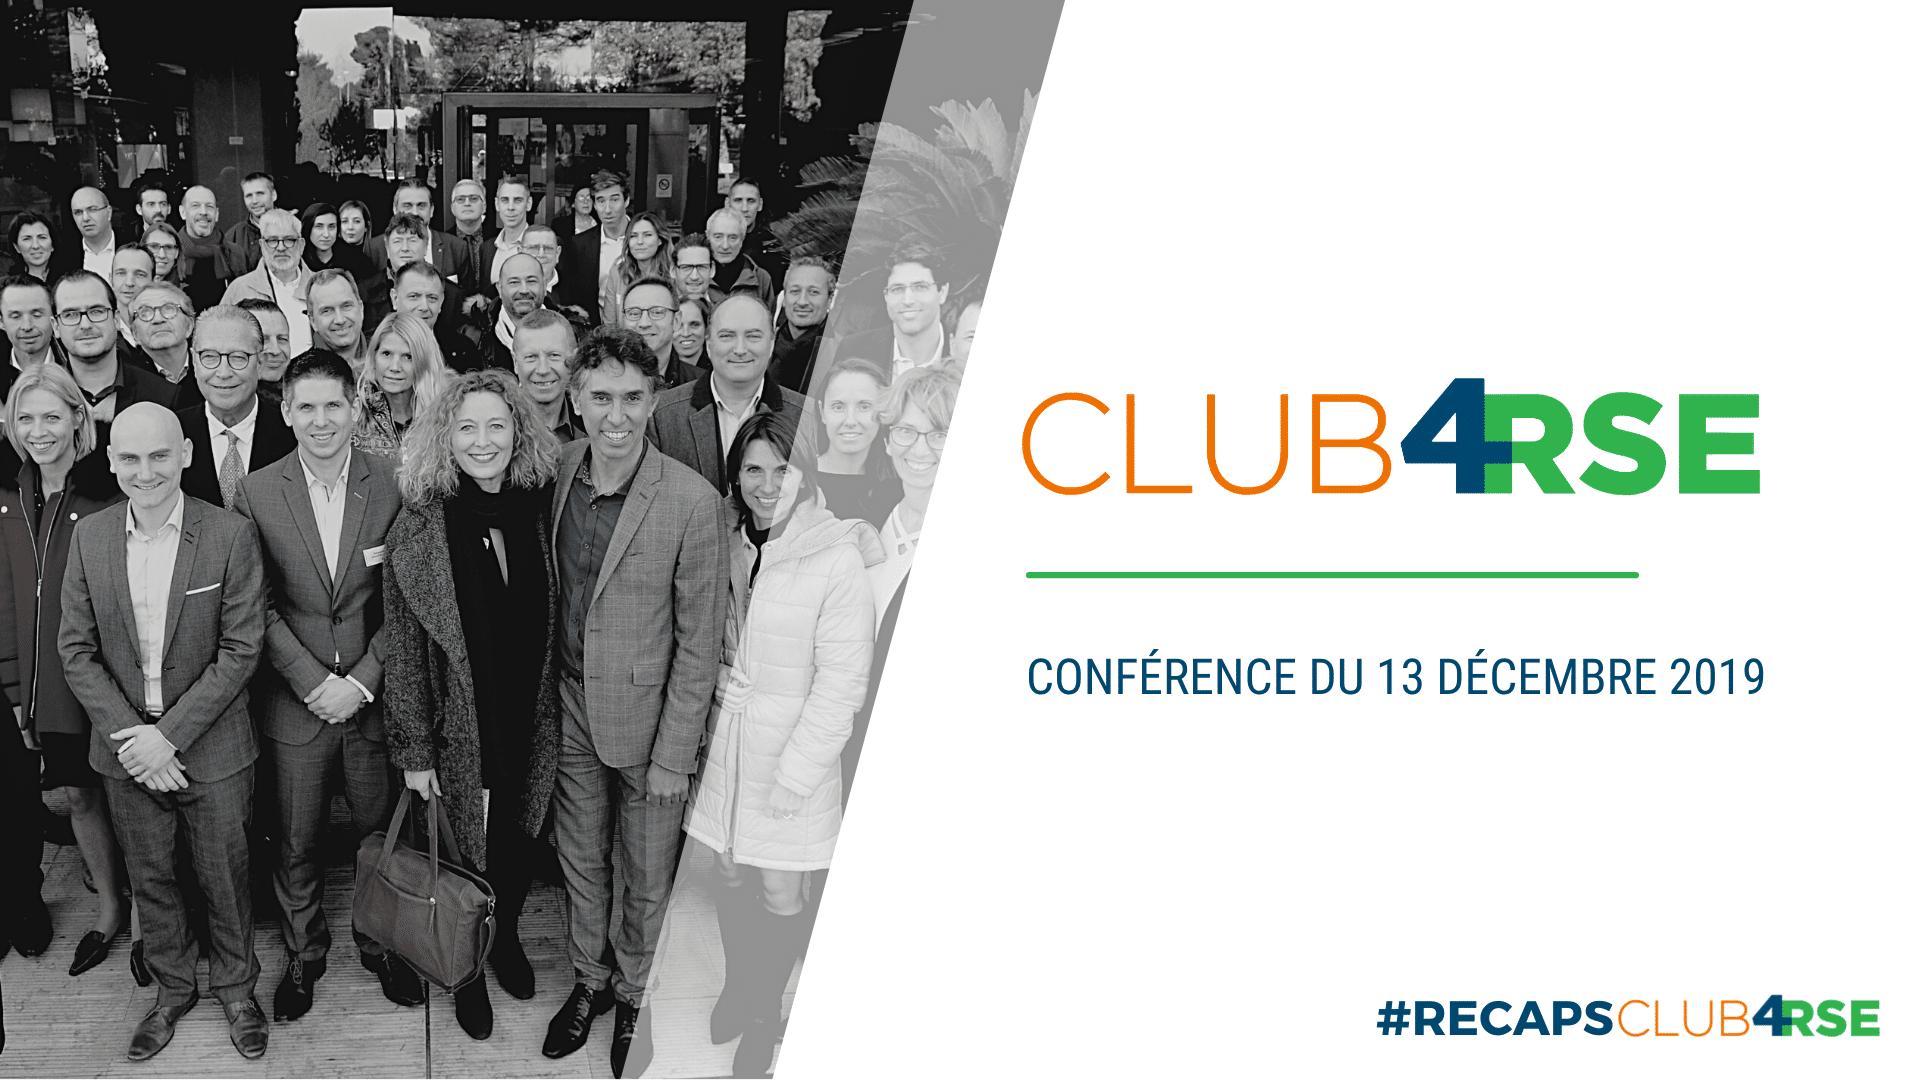 conference-club4rse